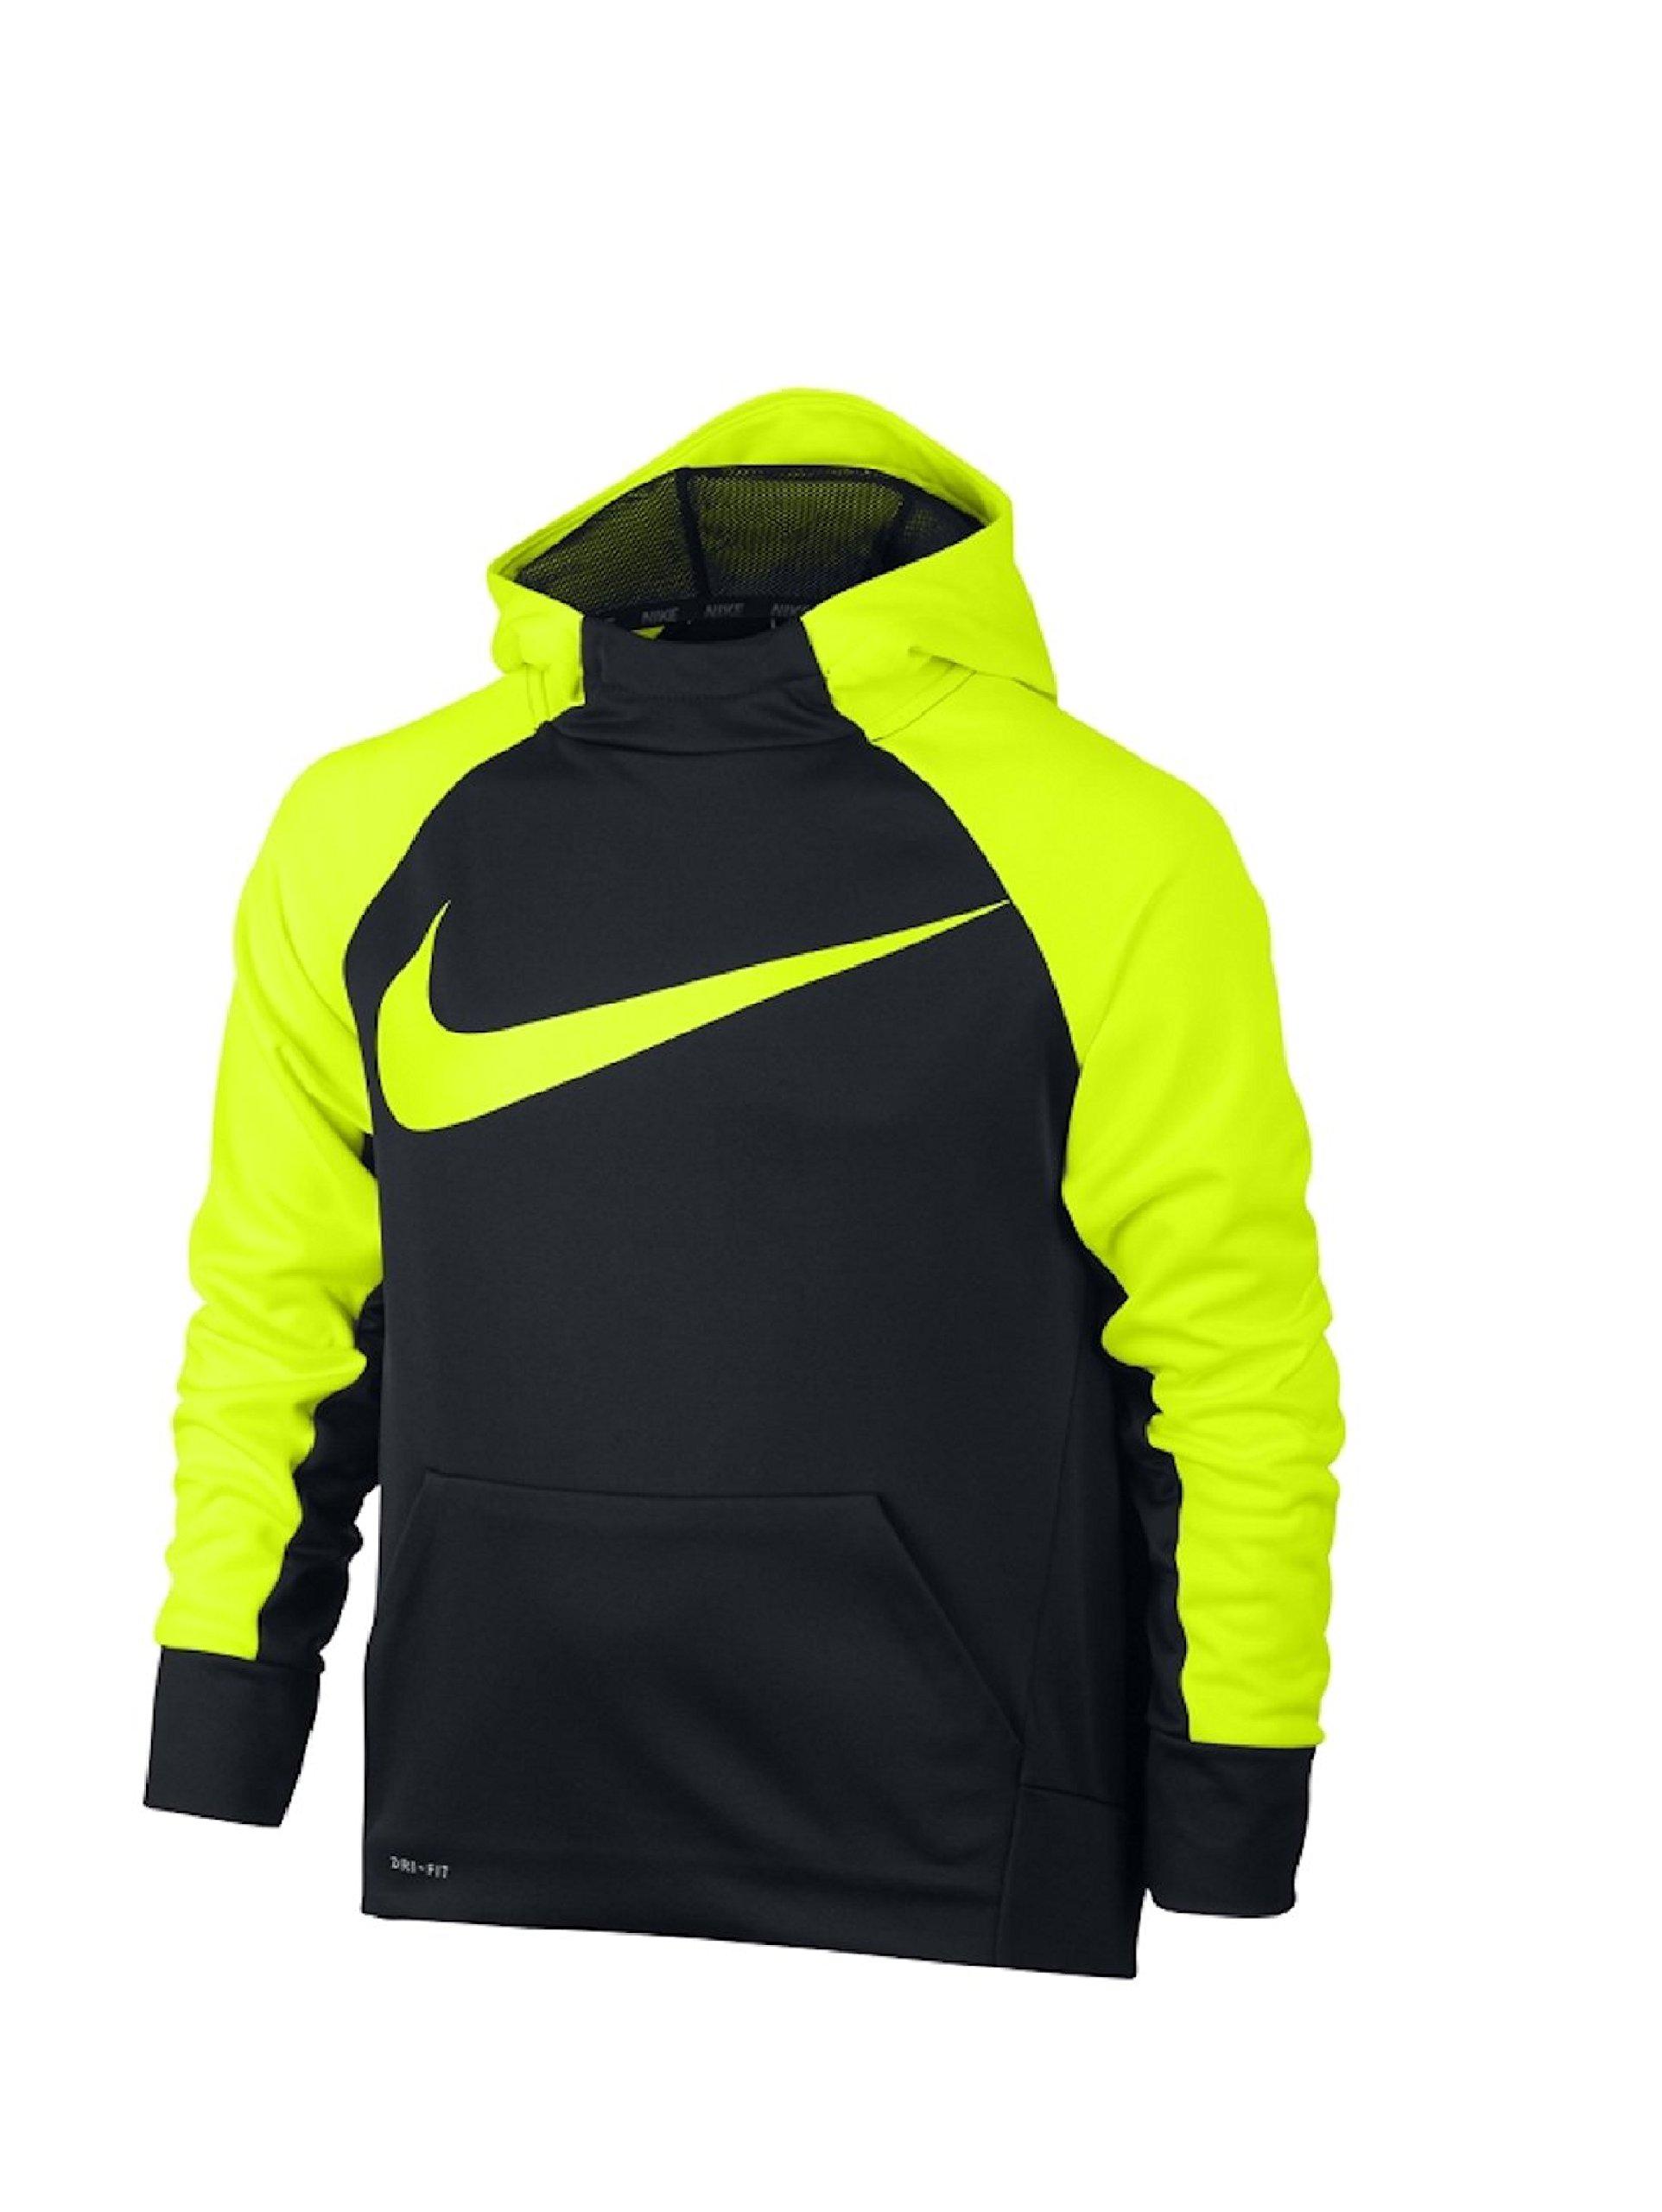 Nike Boy's Therma Training Hoodie Black/Volt Size Medium